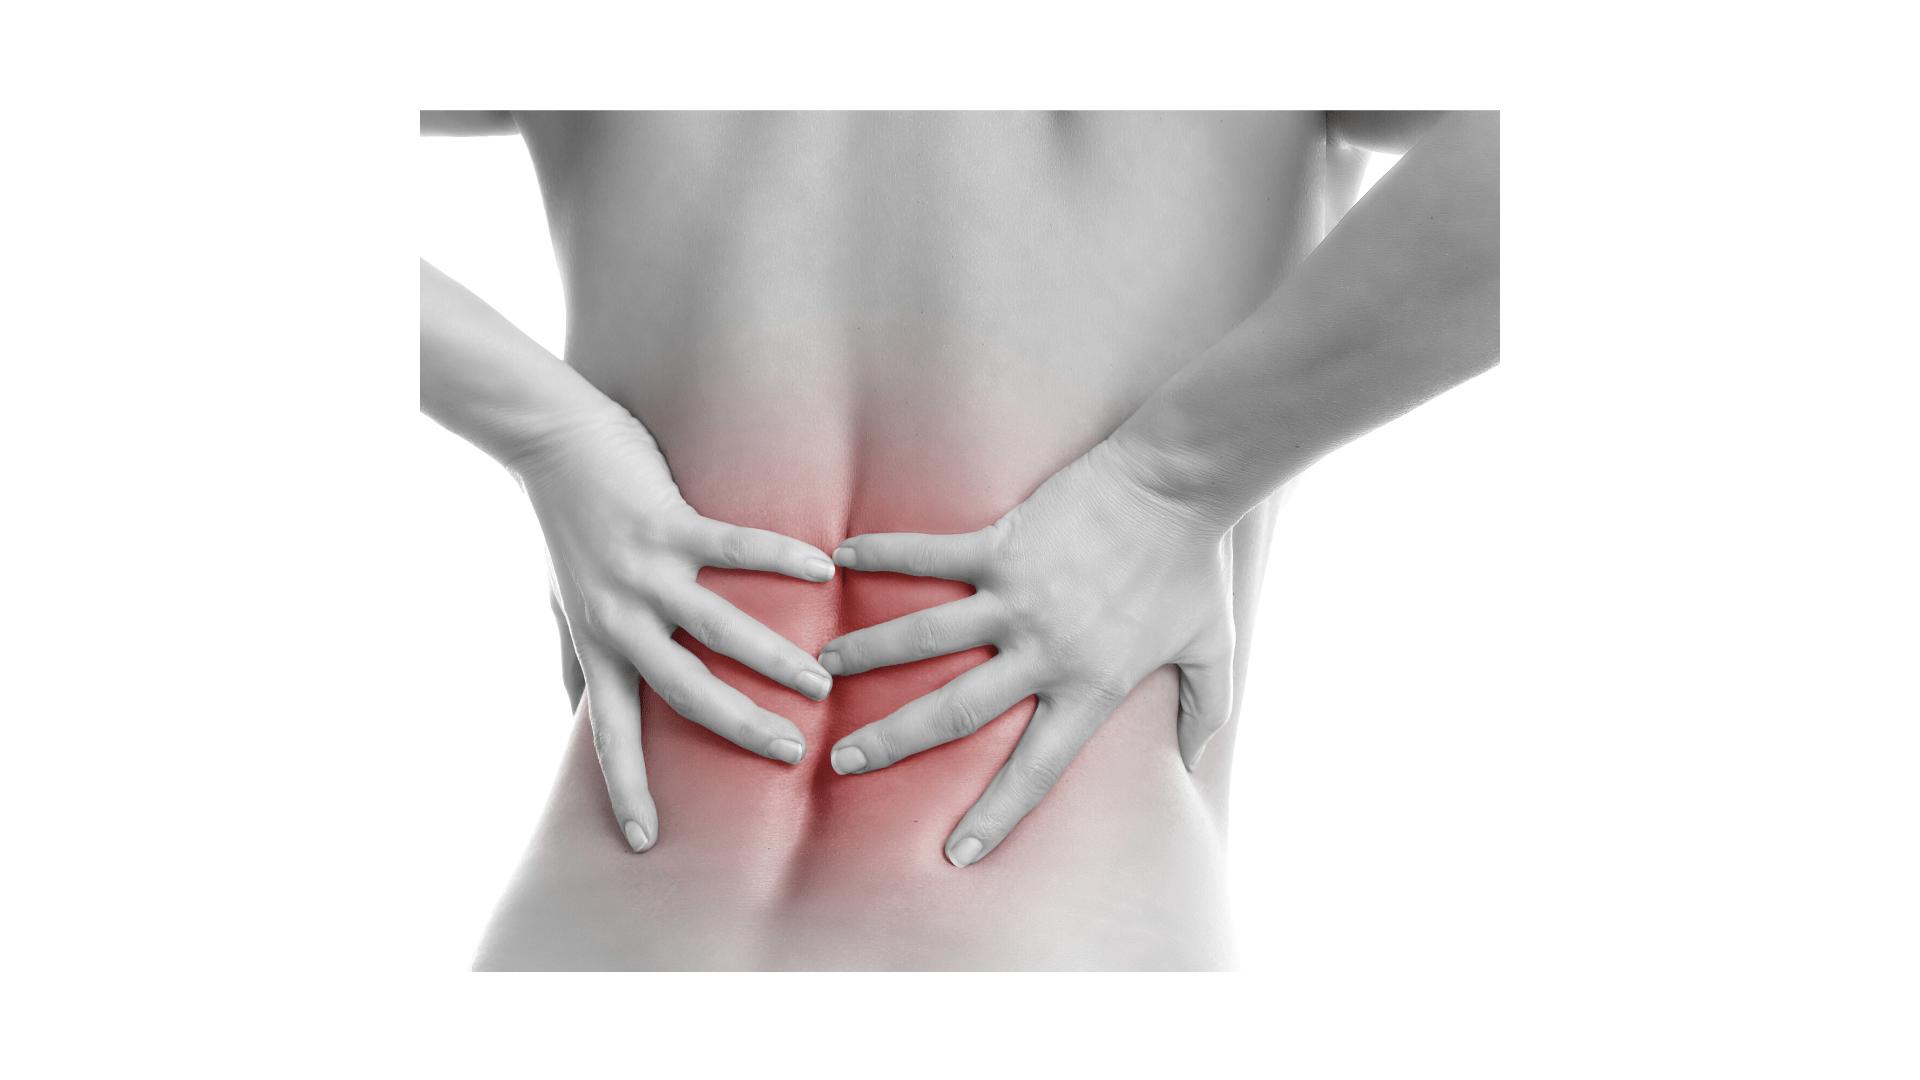 Operatia de hernie de disc: cind trebuie facuta si cum ne pregatim?